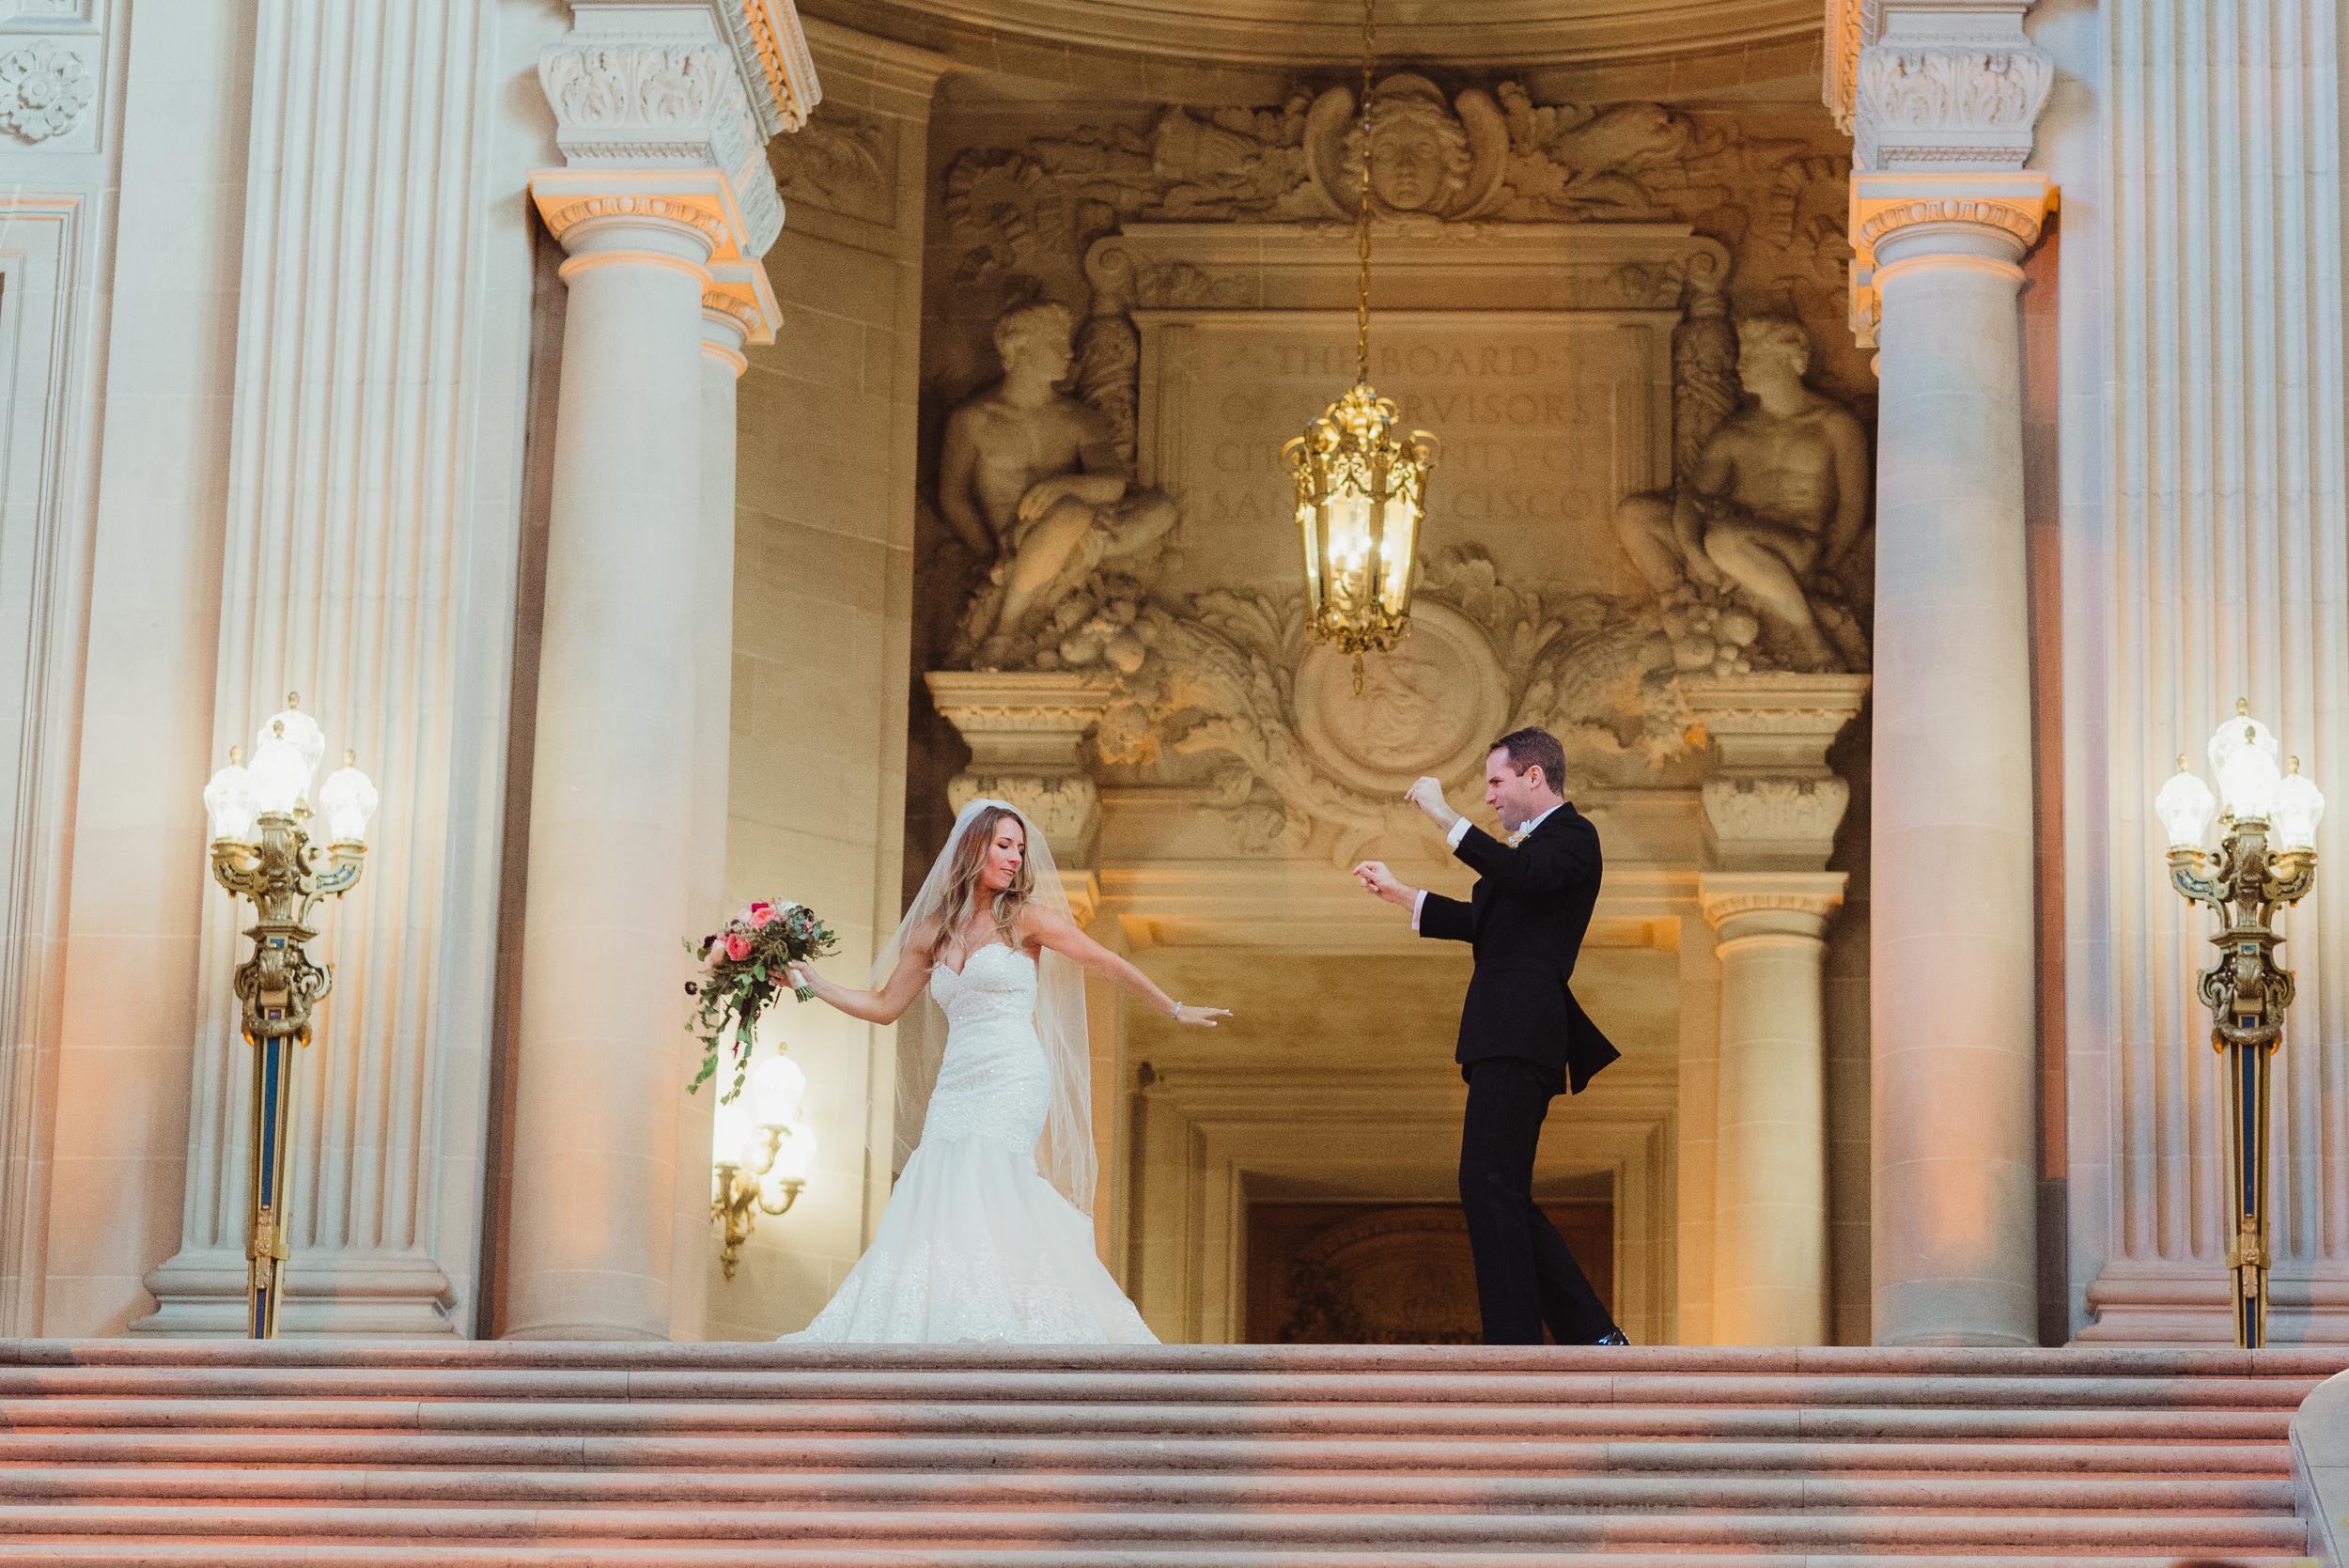 71-elegant-san-francisco-city-hall-wedding-vivianchen-0816.jpg